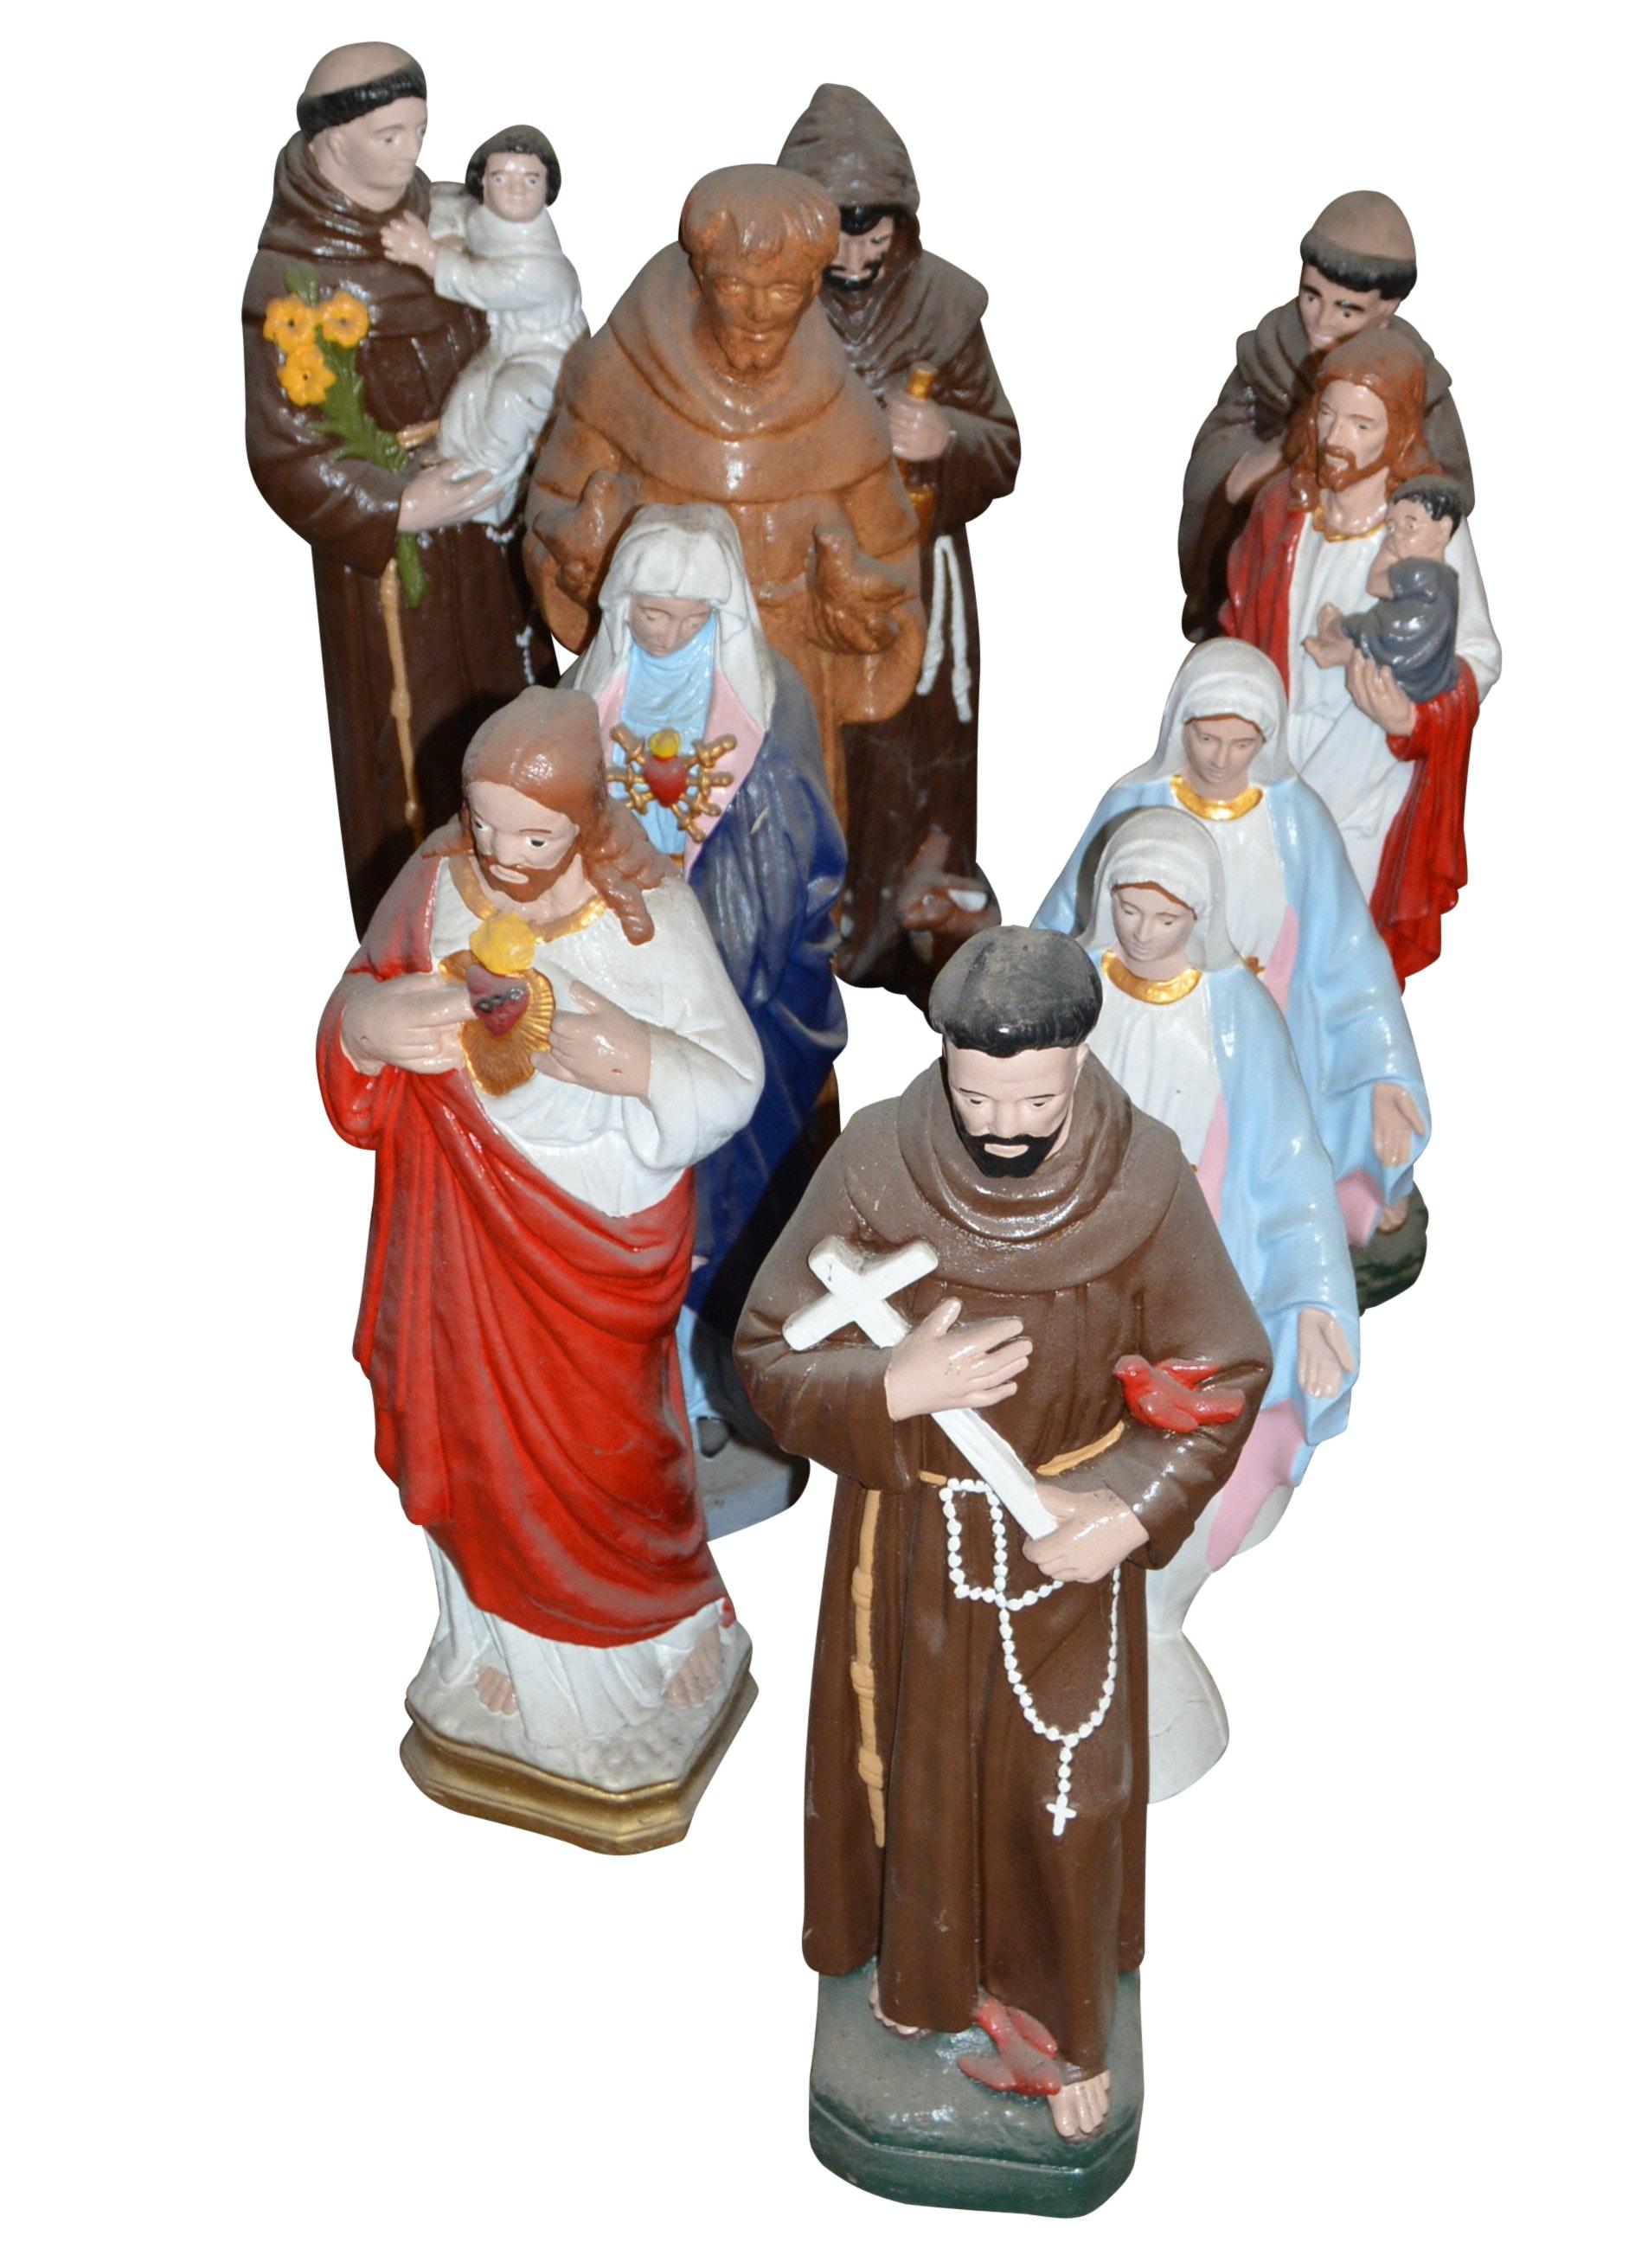 Assorted Religious Garden Statues